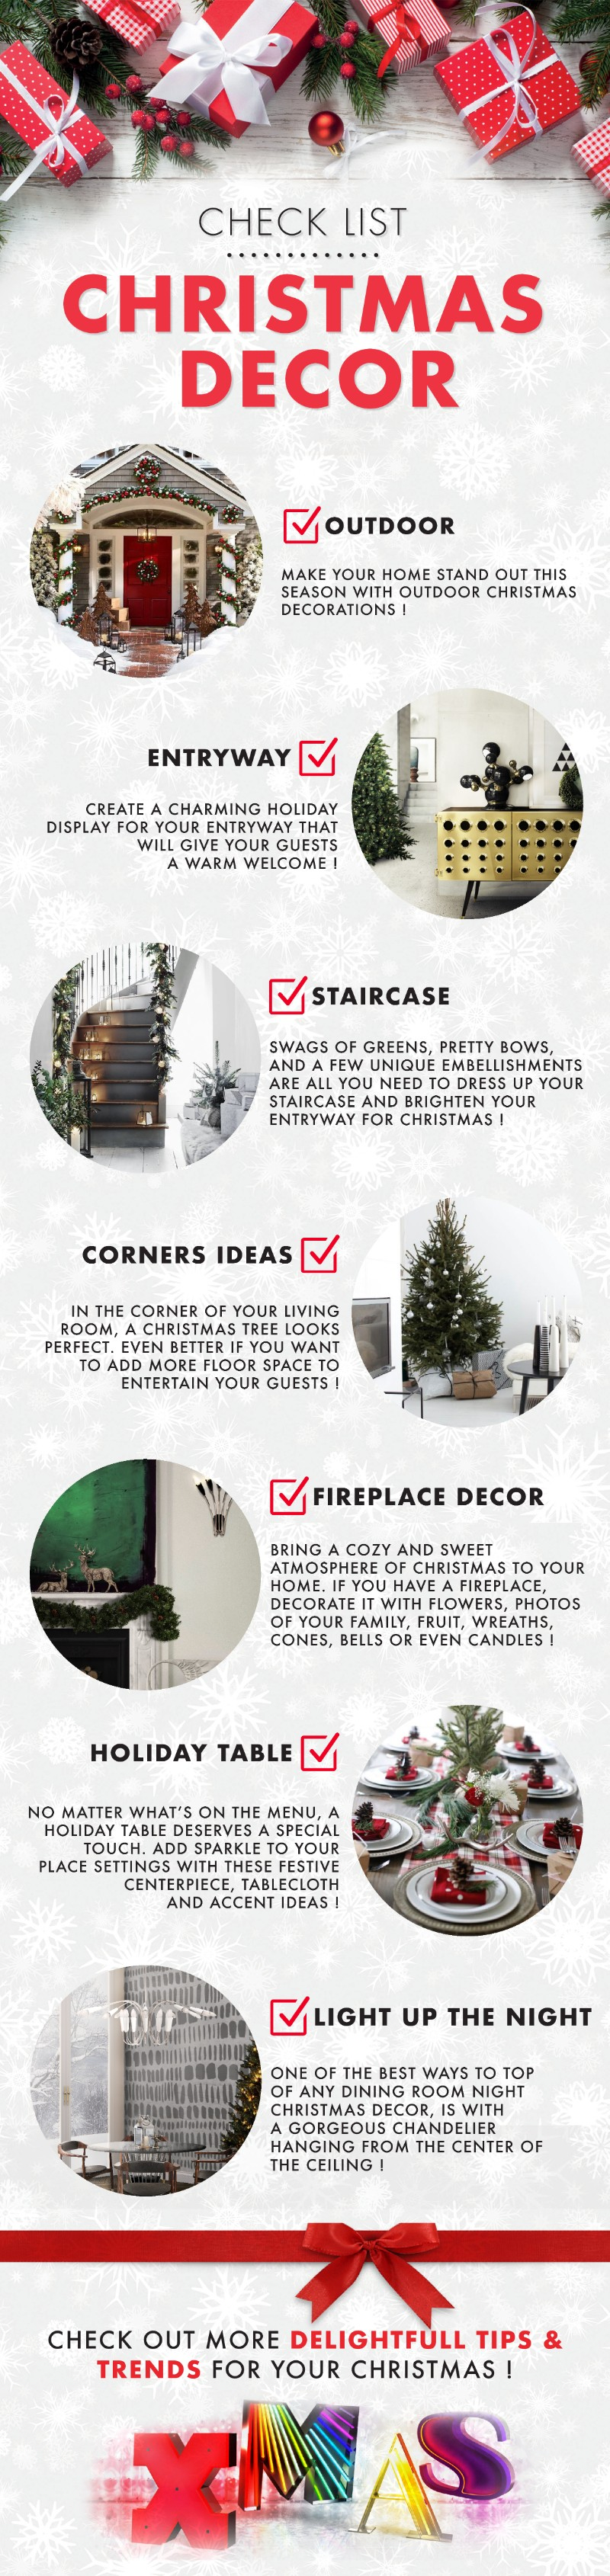 Christmas 2017 Gift Guide for Design Lovers 8